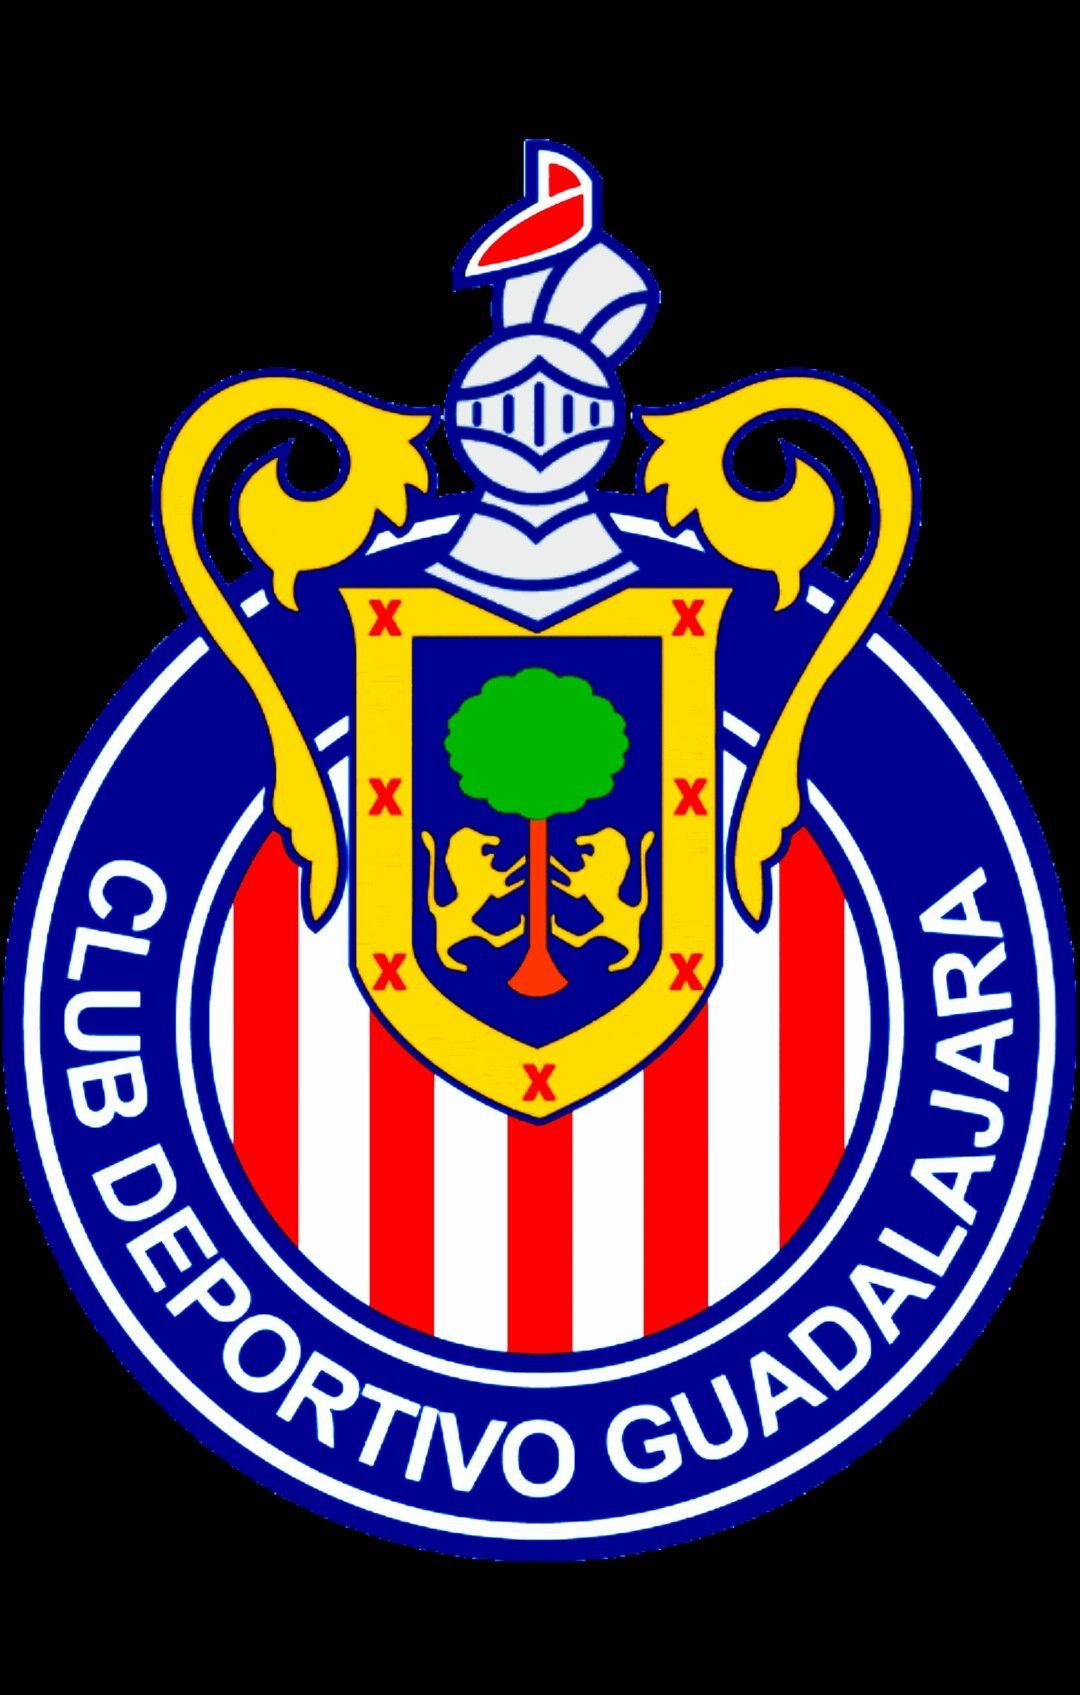 Team badge image by Saul Zuniga on CHIVAS DE GUADALAJARA